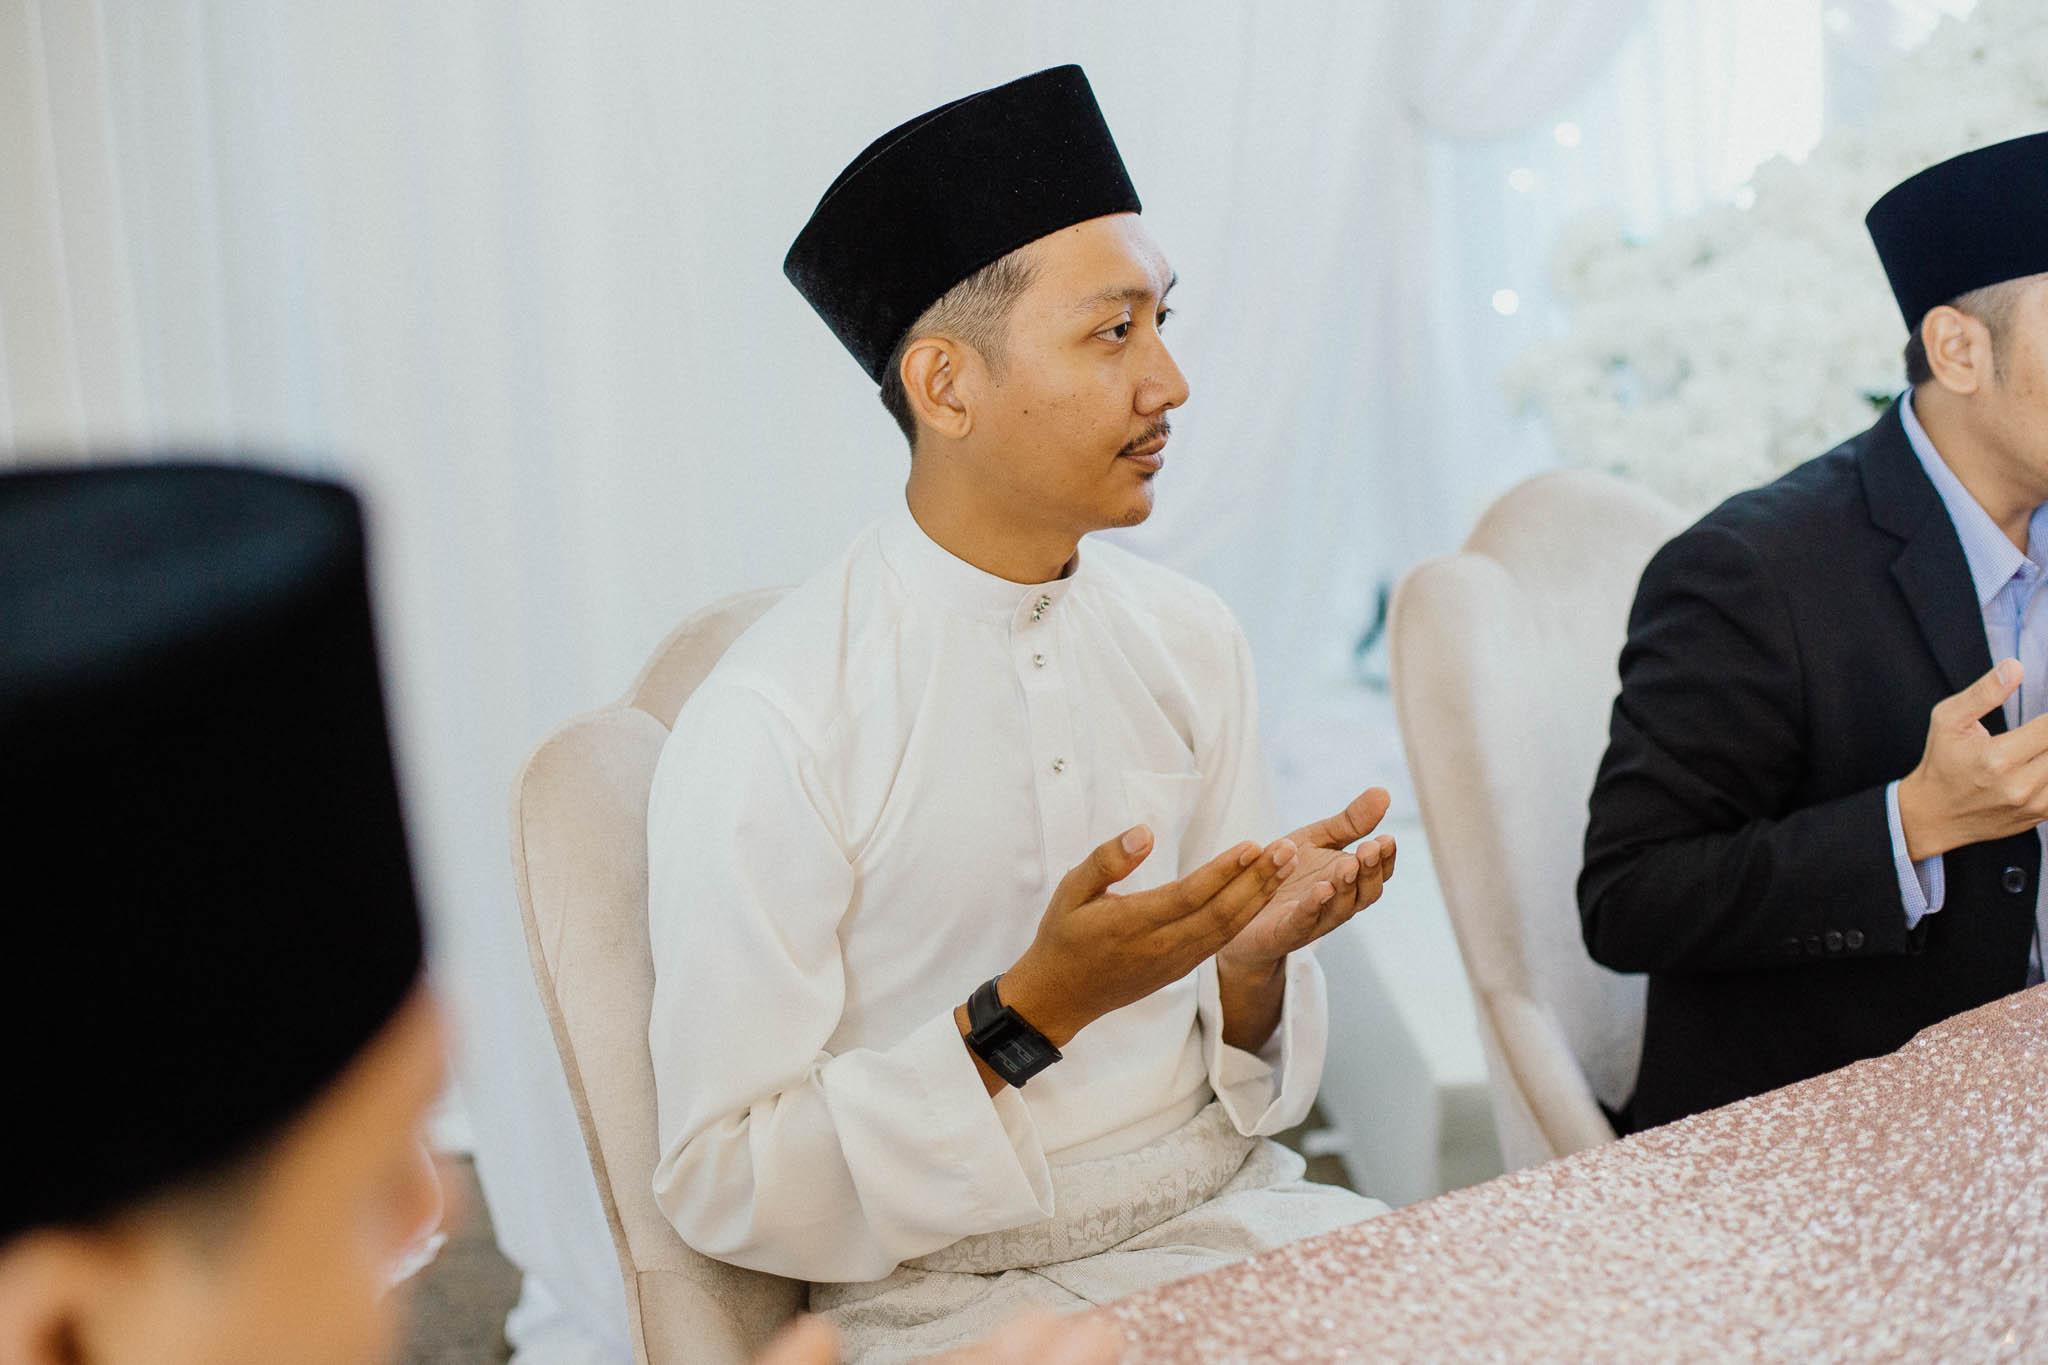 singapore-wedding-photographer-wedding-nufail-addafiq-016.jpg